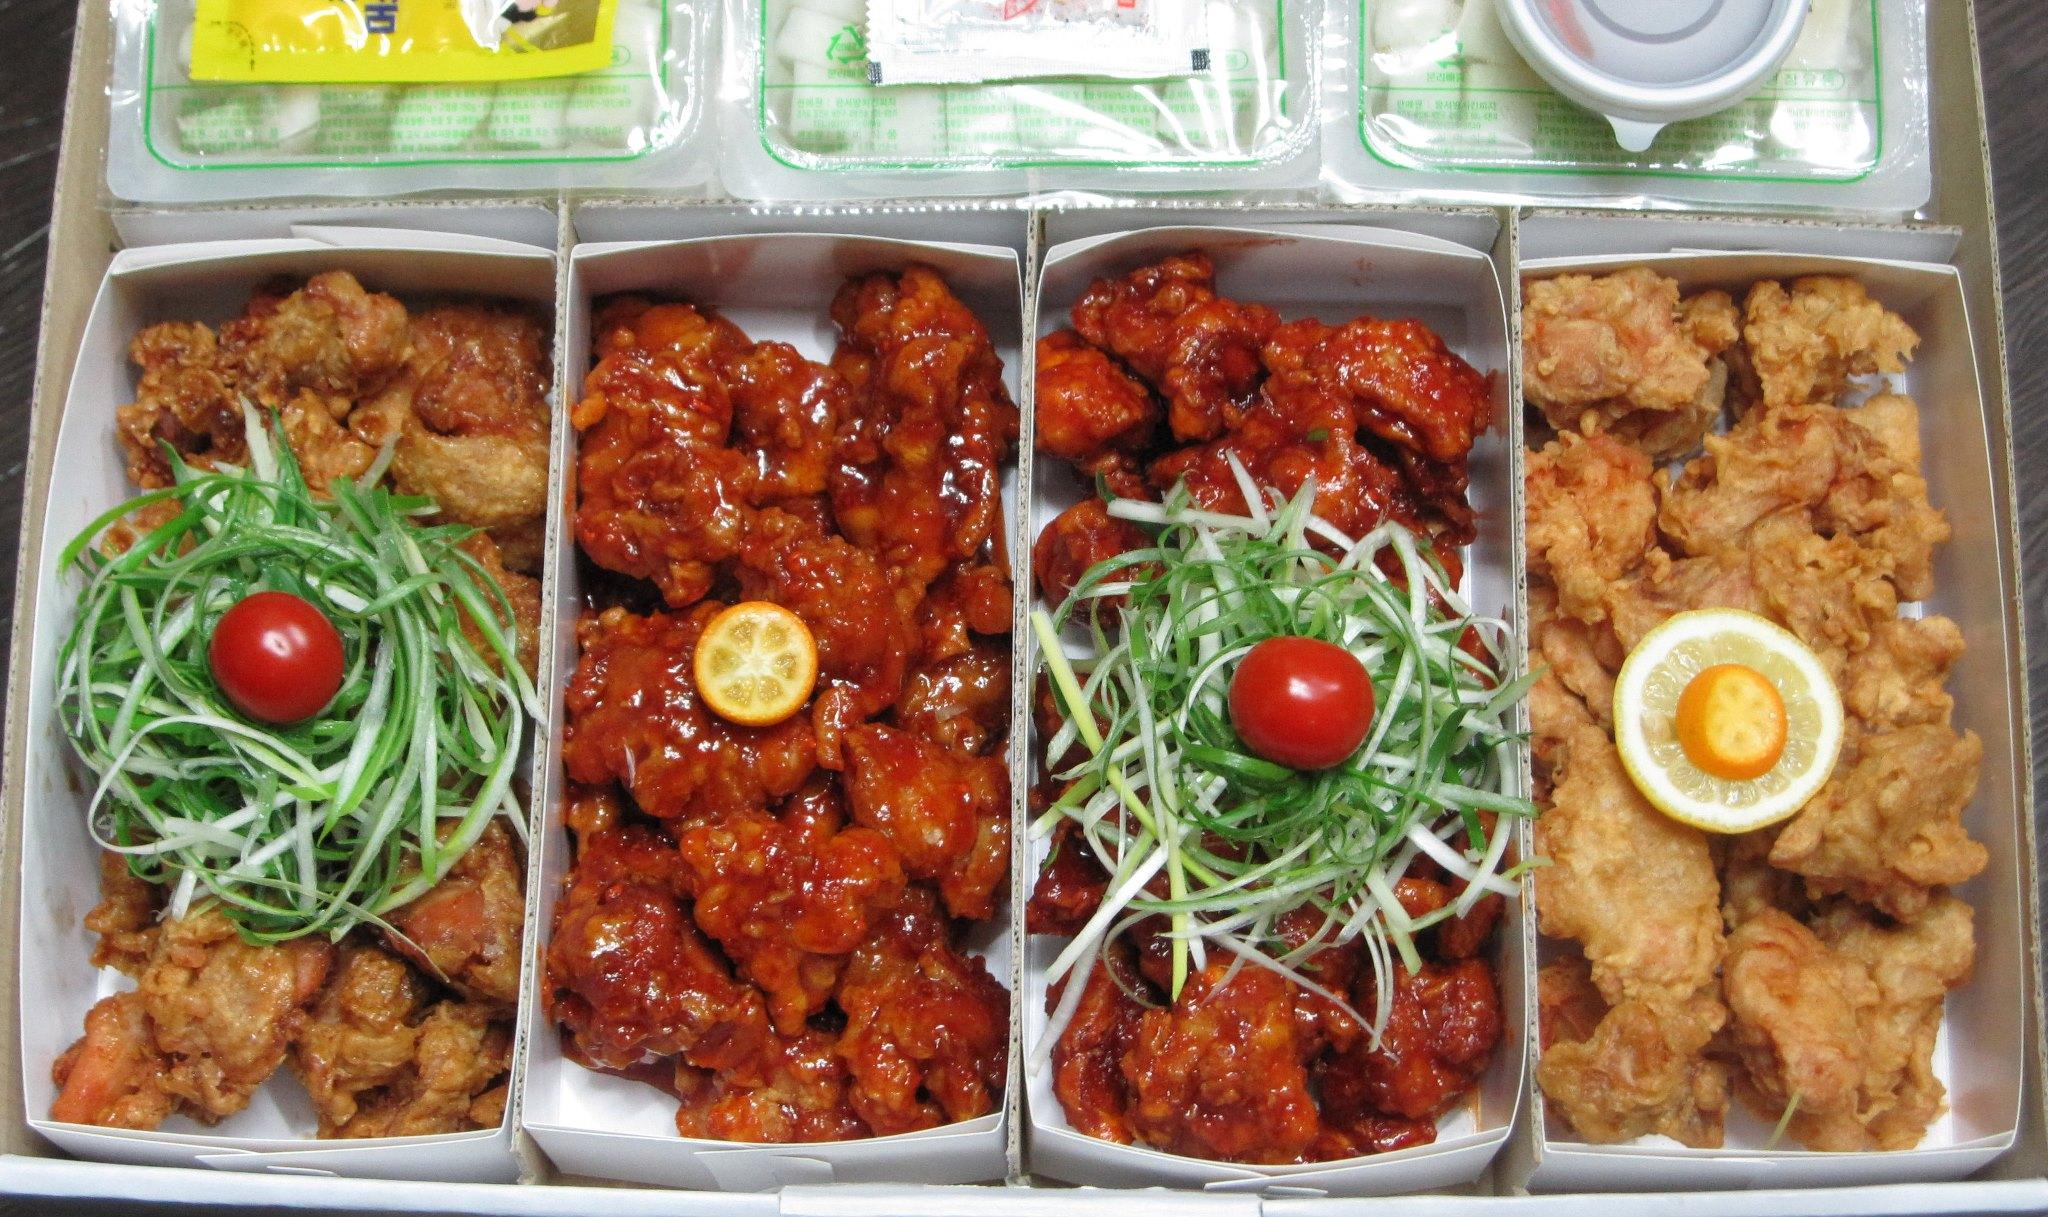 Popular Fried Chicken brands in Korea